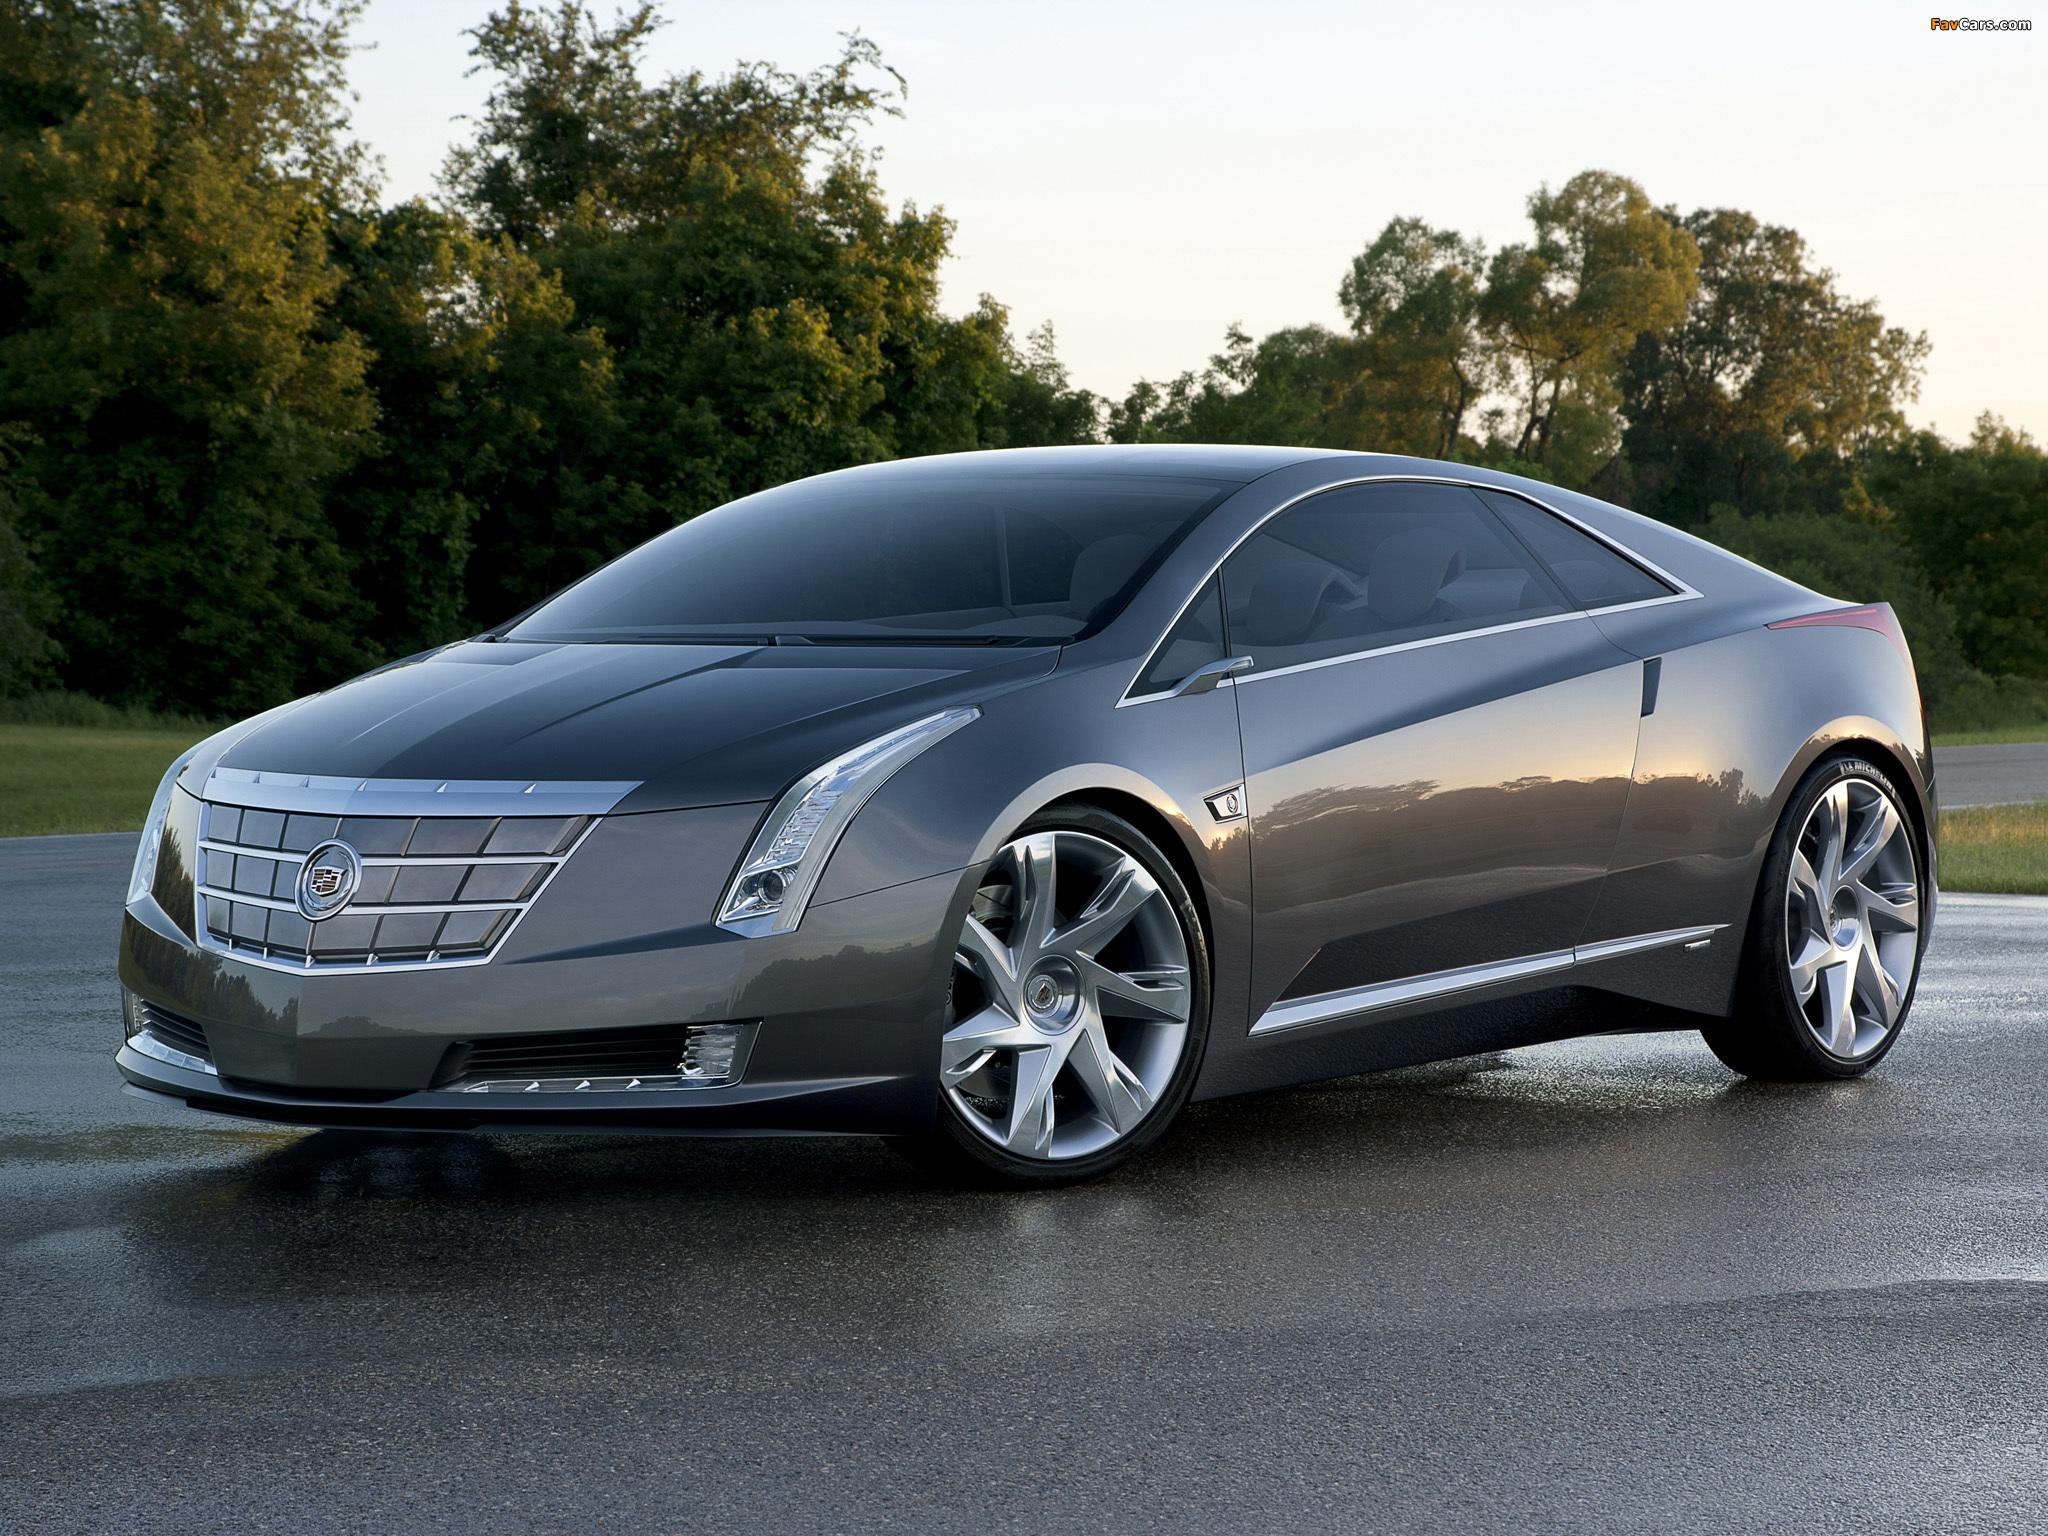 Cadillac Converj Concept 2009 pictures (2048 x 1536)